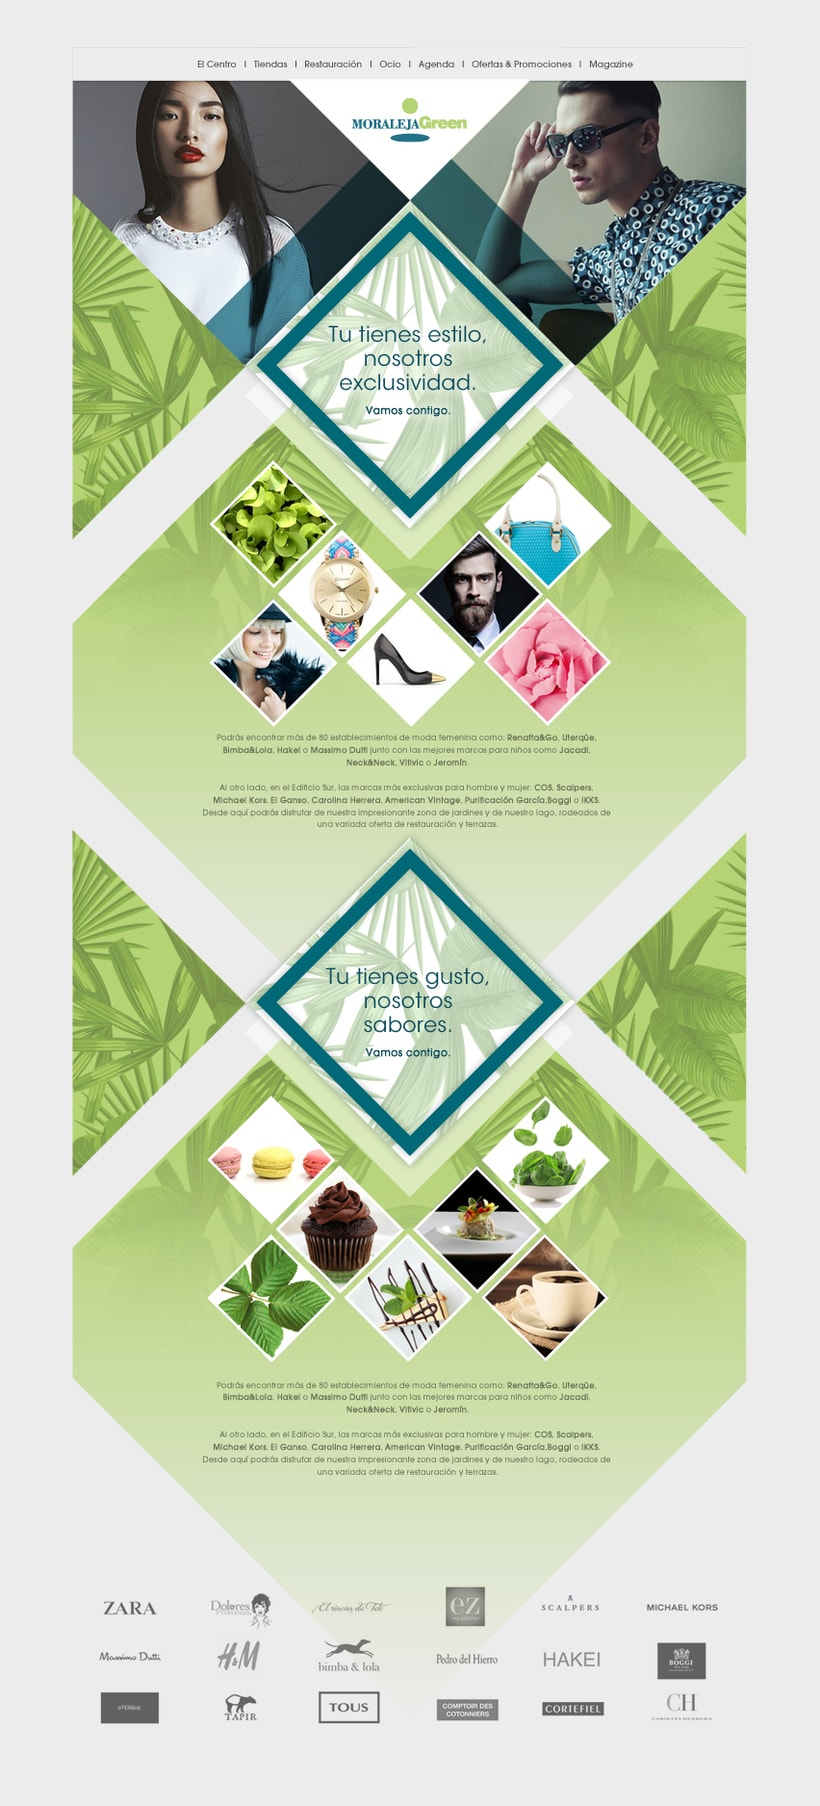 CC Moraleja Green -1